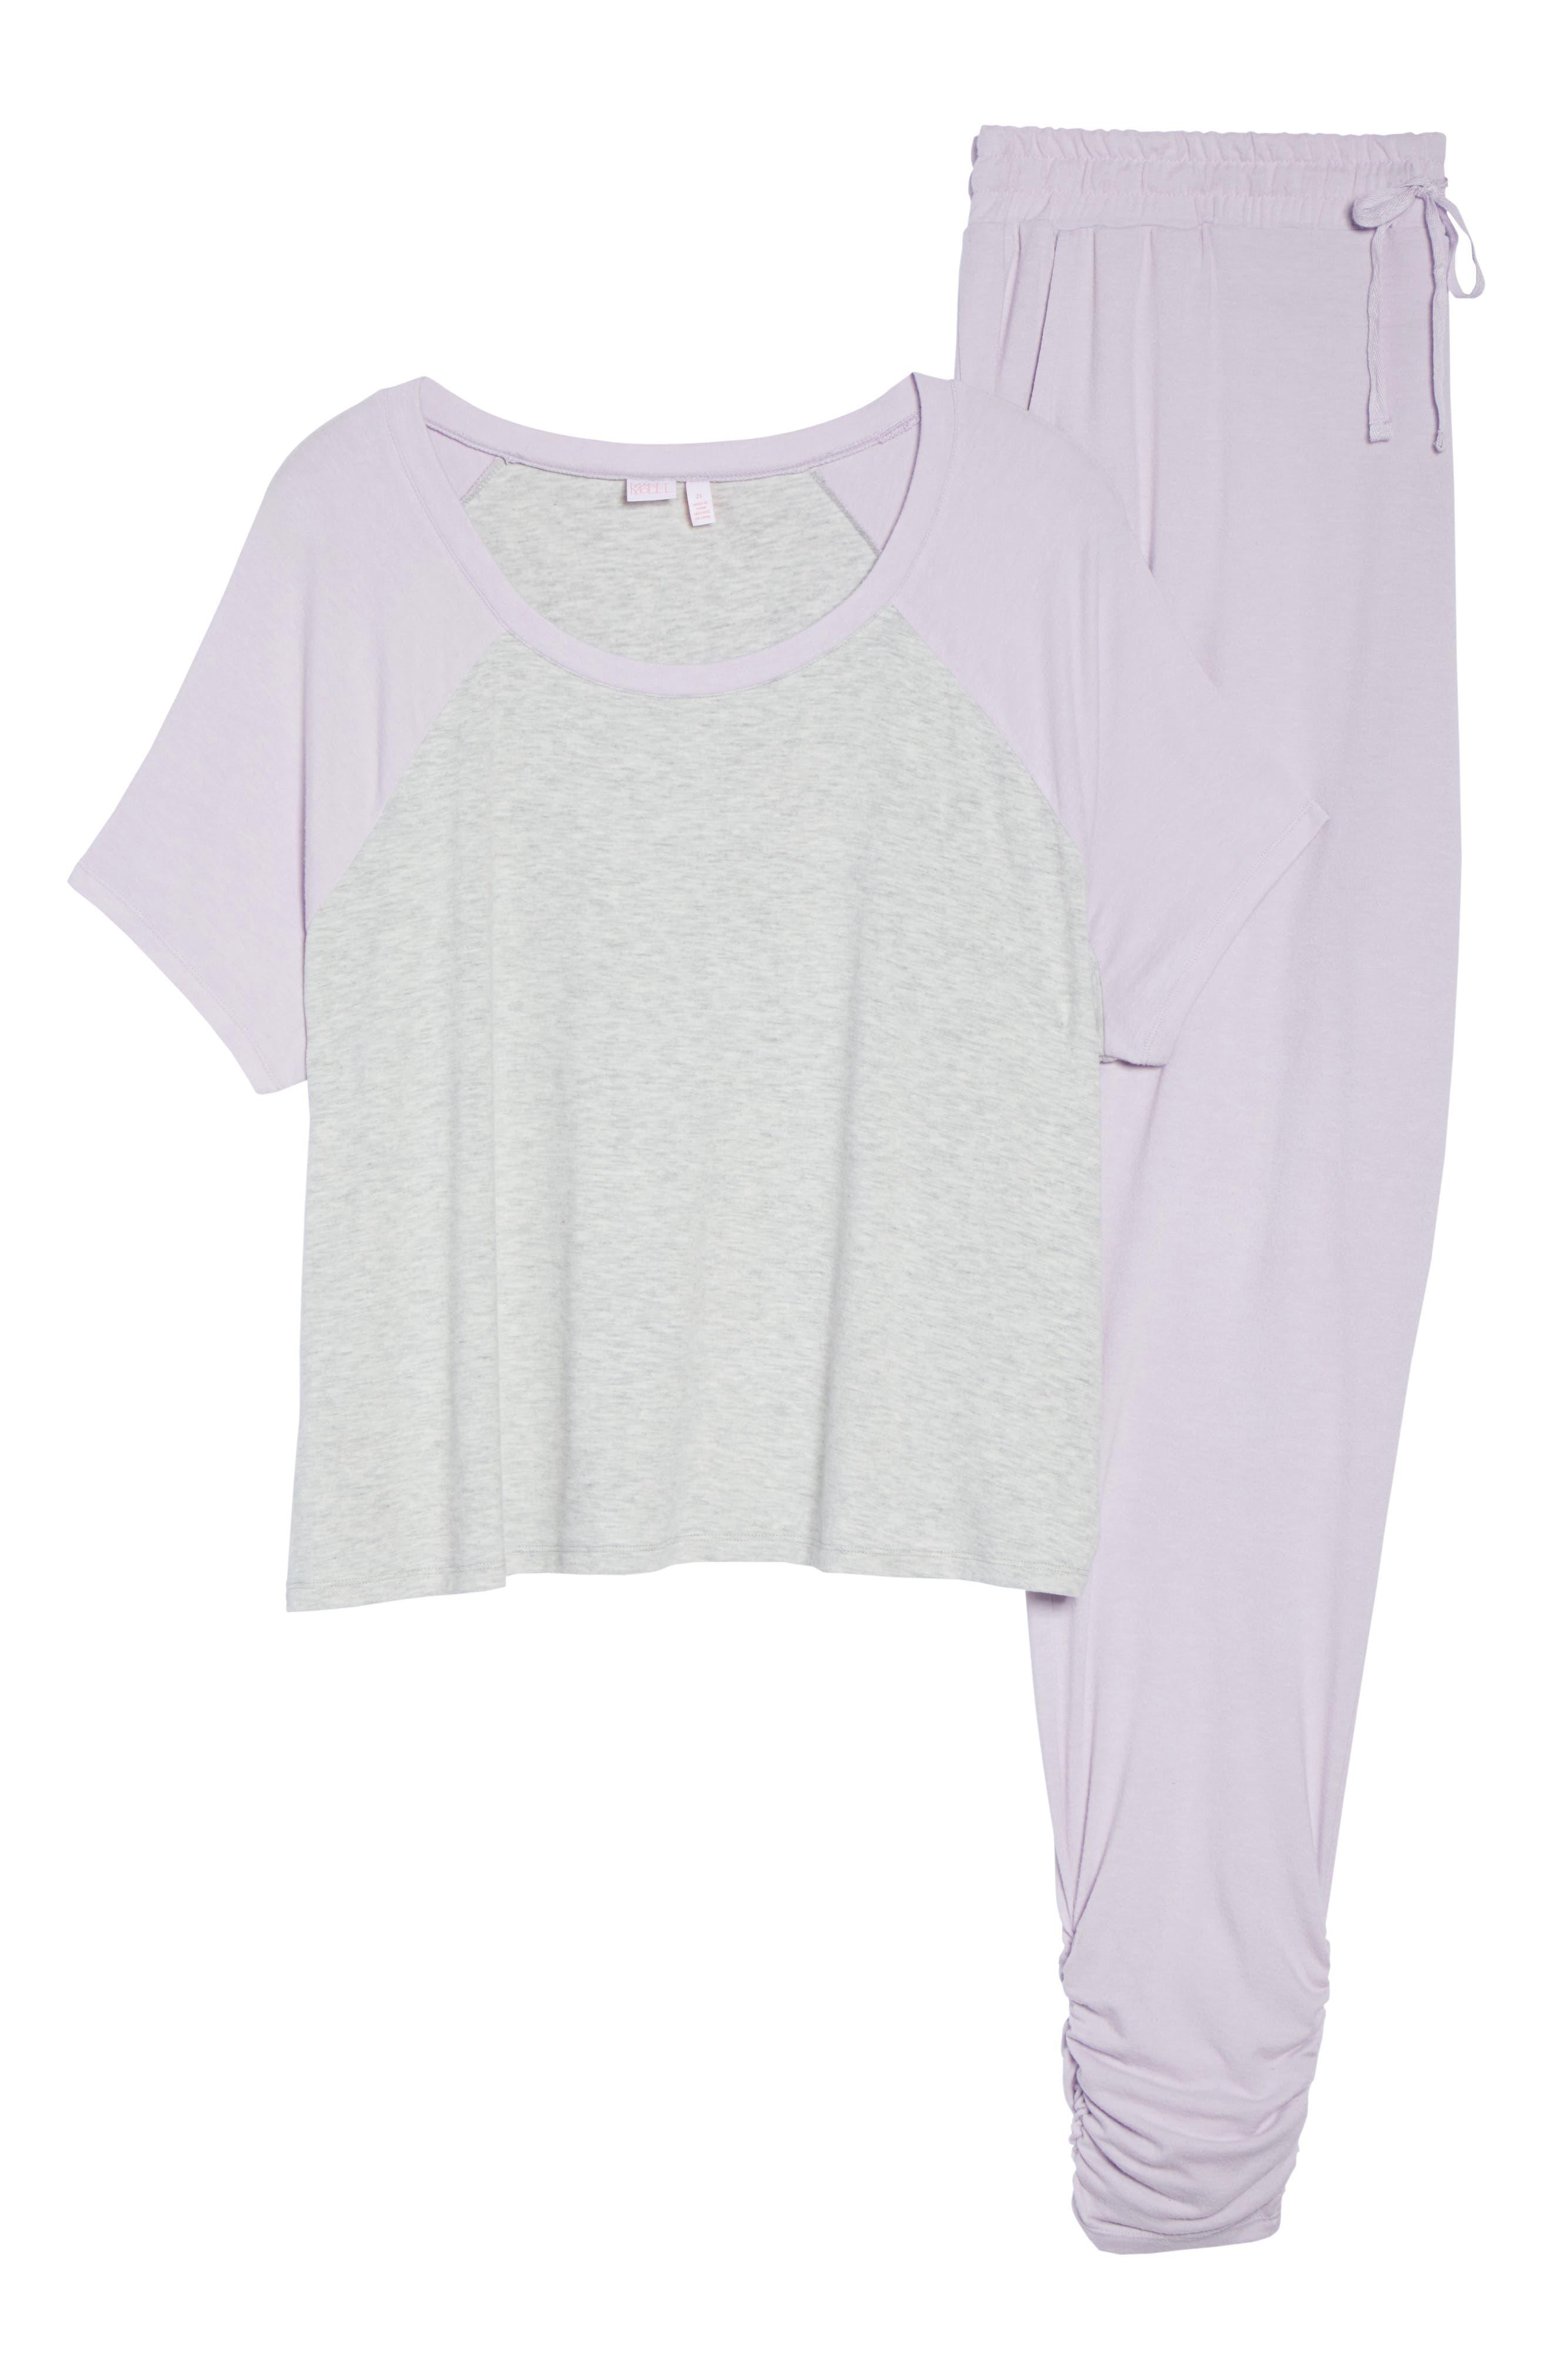 Cloud 9 Pajamas,                             Alternate thumbnail 6, color,                             050